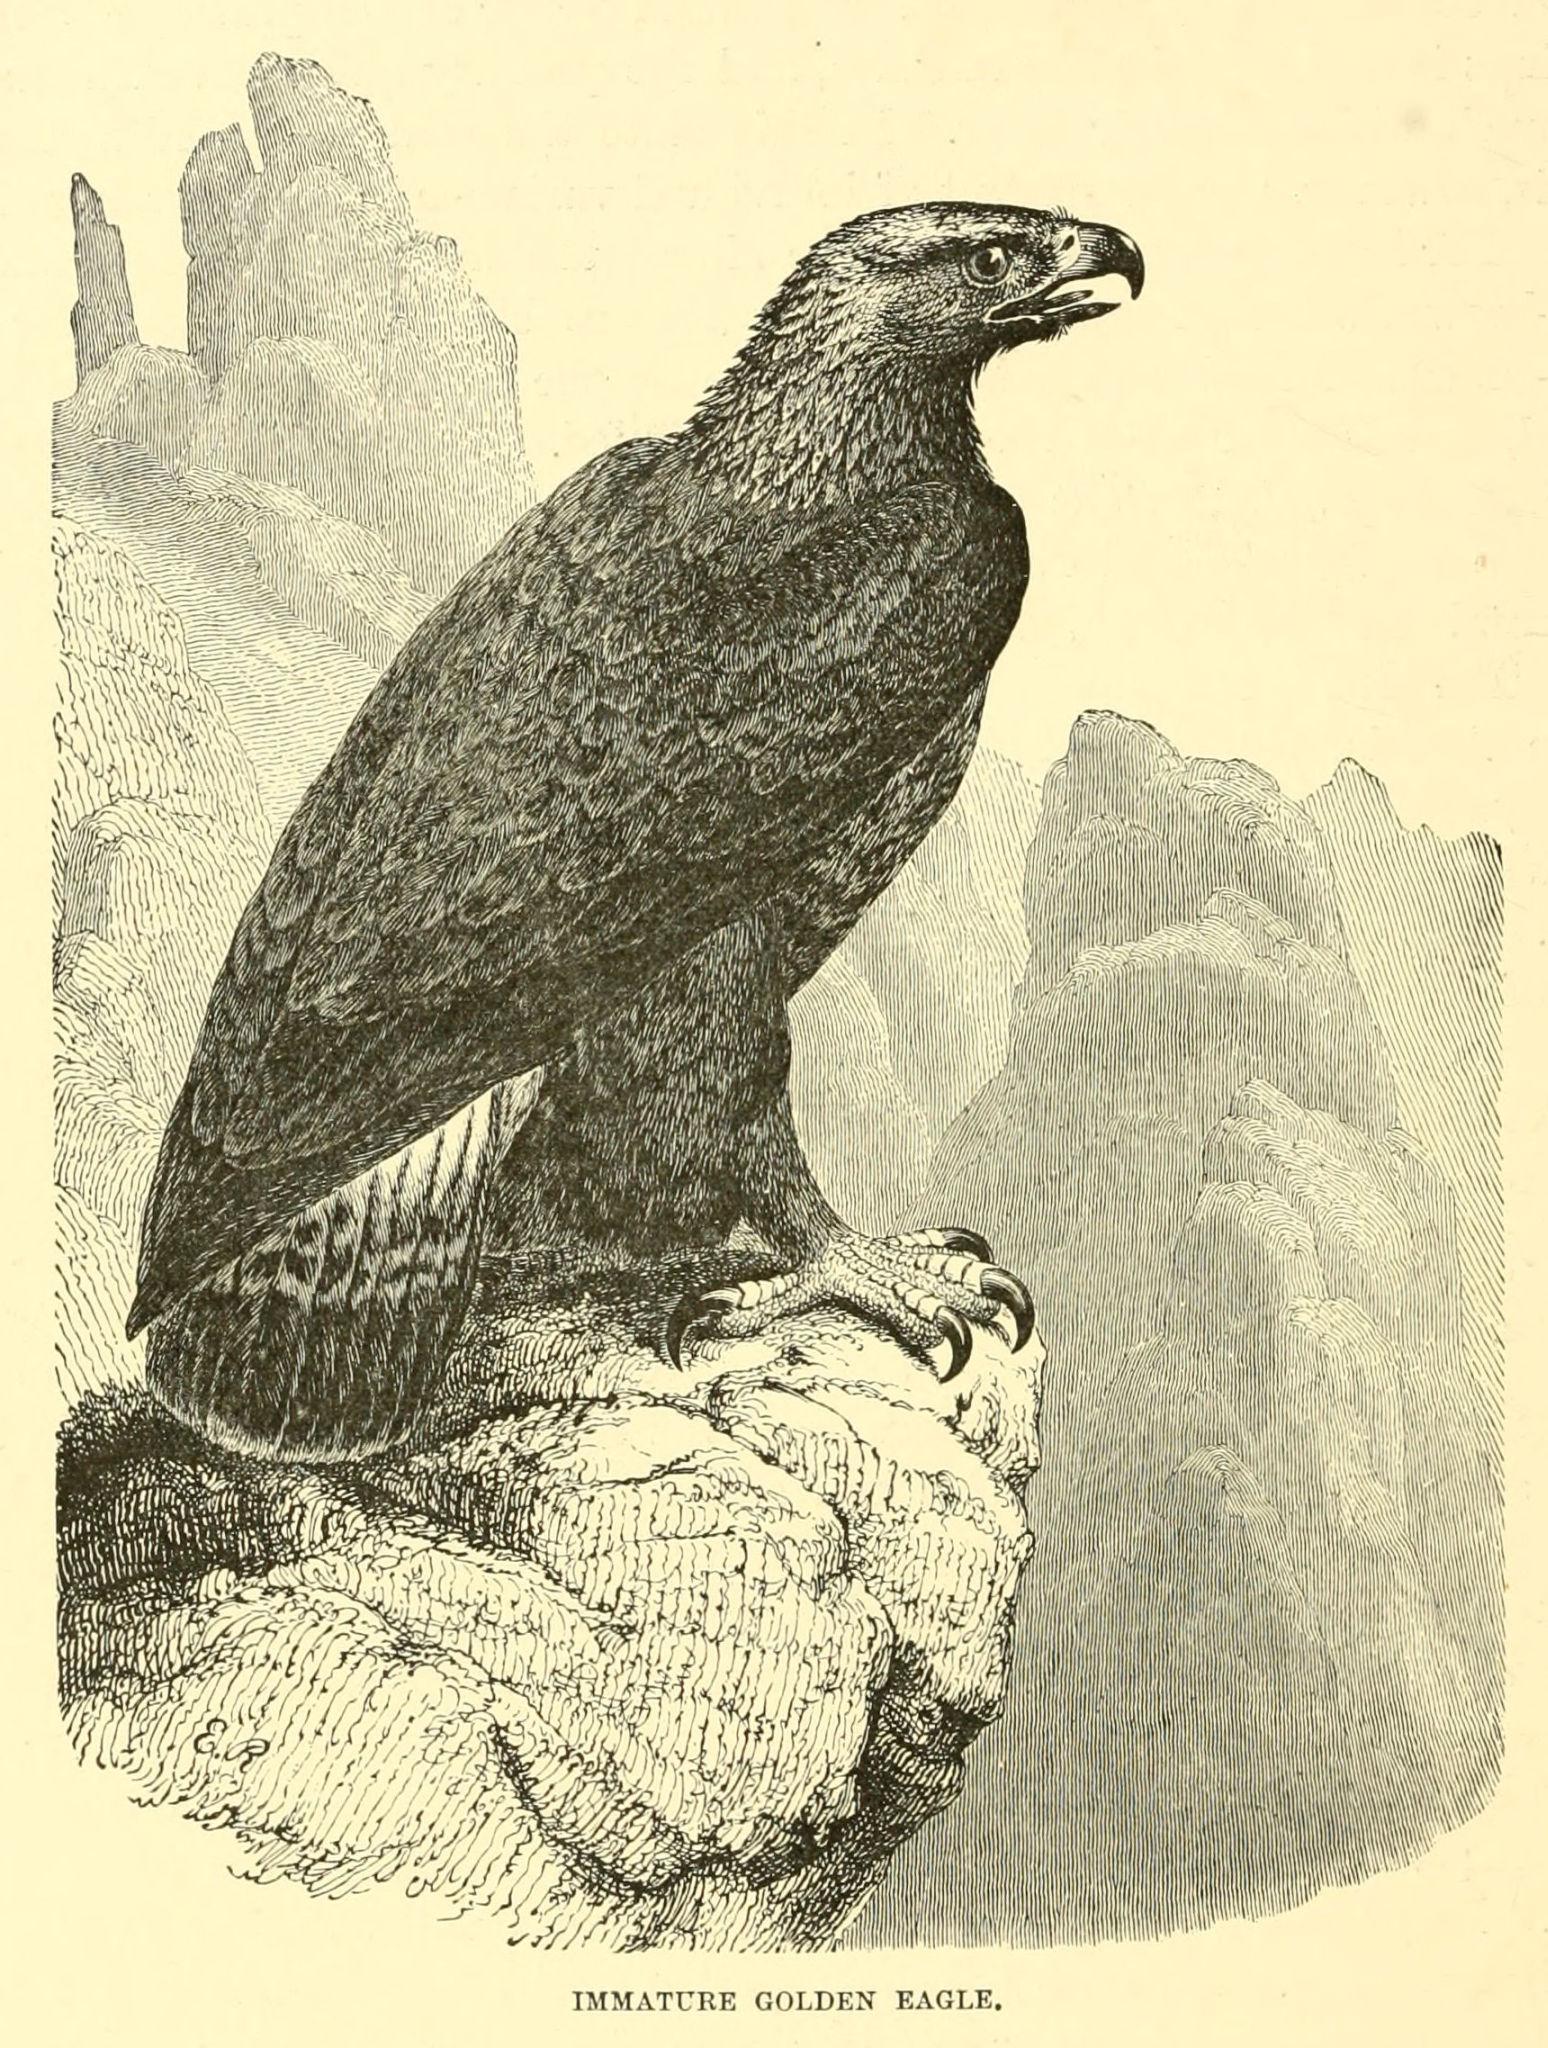 Immature golden eagle images